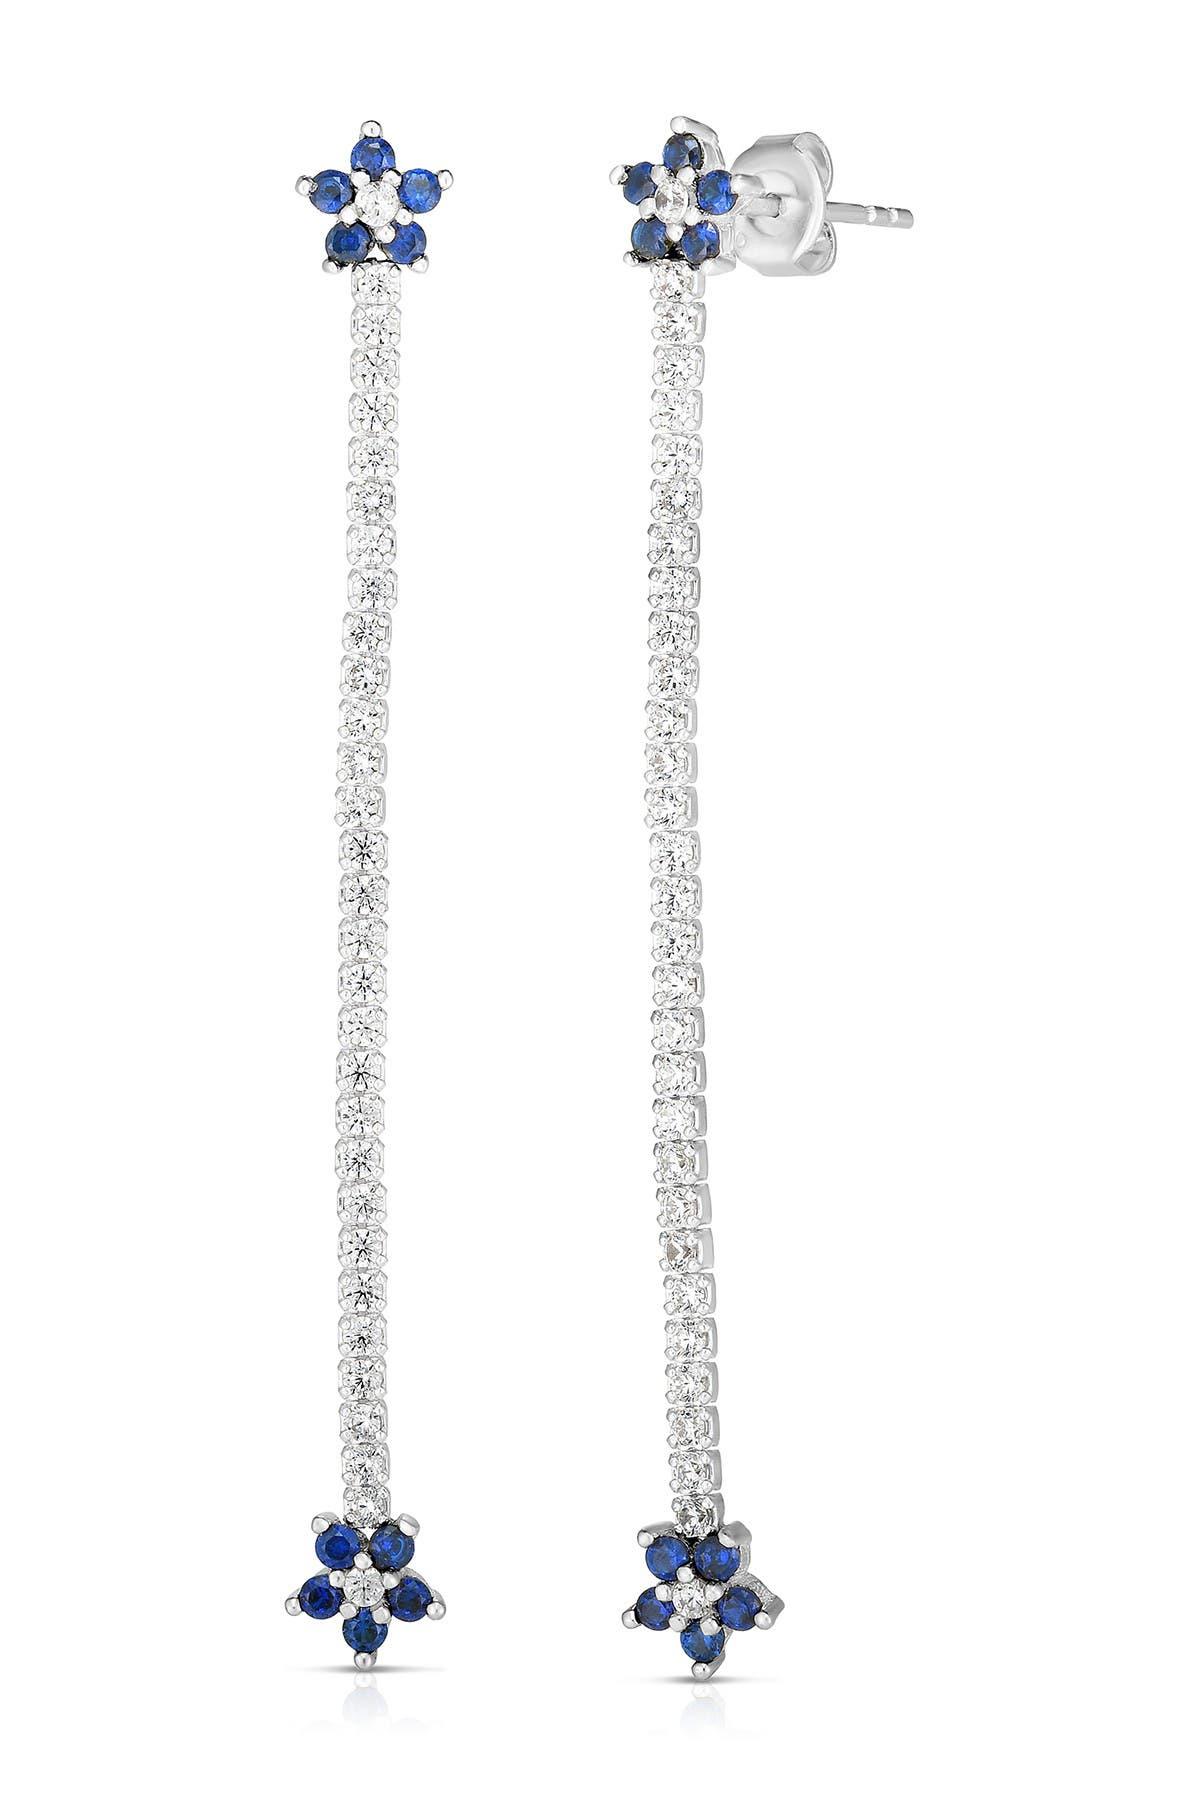 Sphera Milano 18K White Gold Plated Sterling Silver CZ Flower Tennis Earrings at Nordstrom Rack